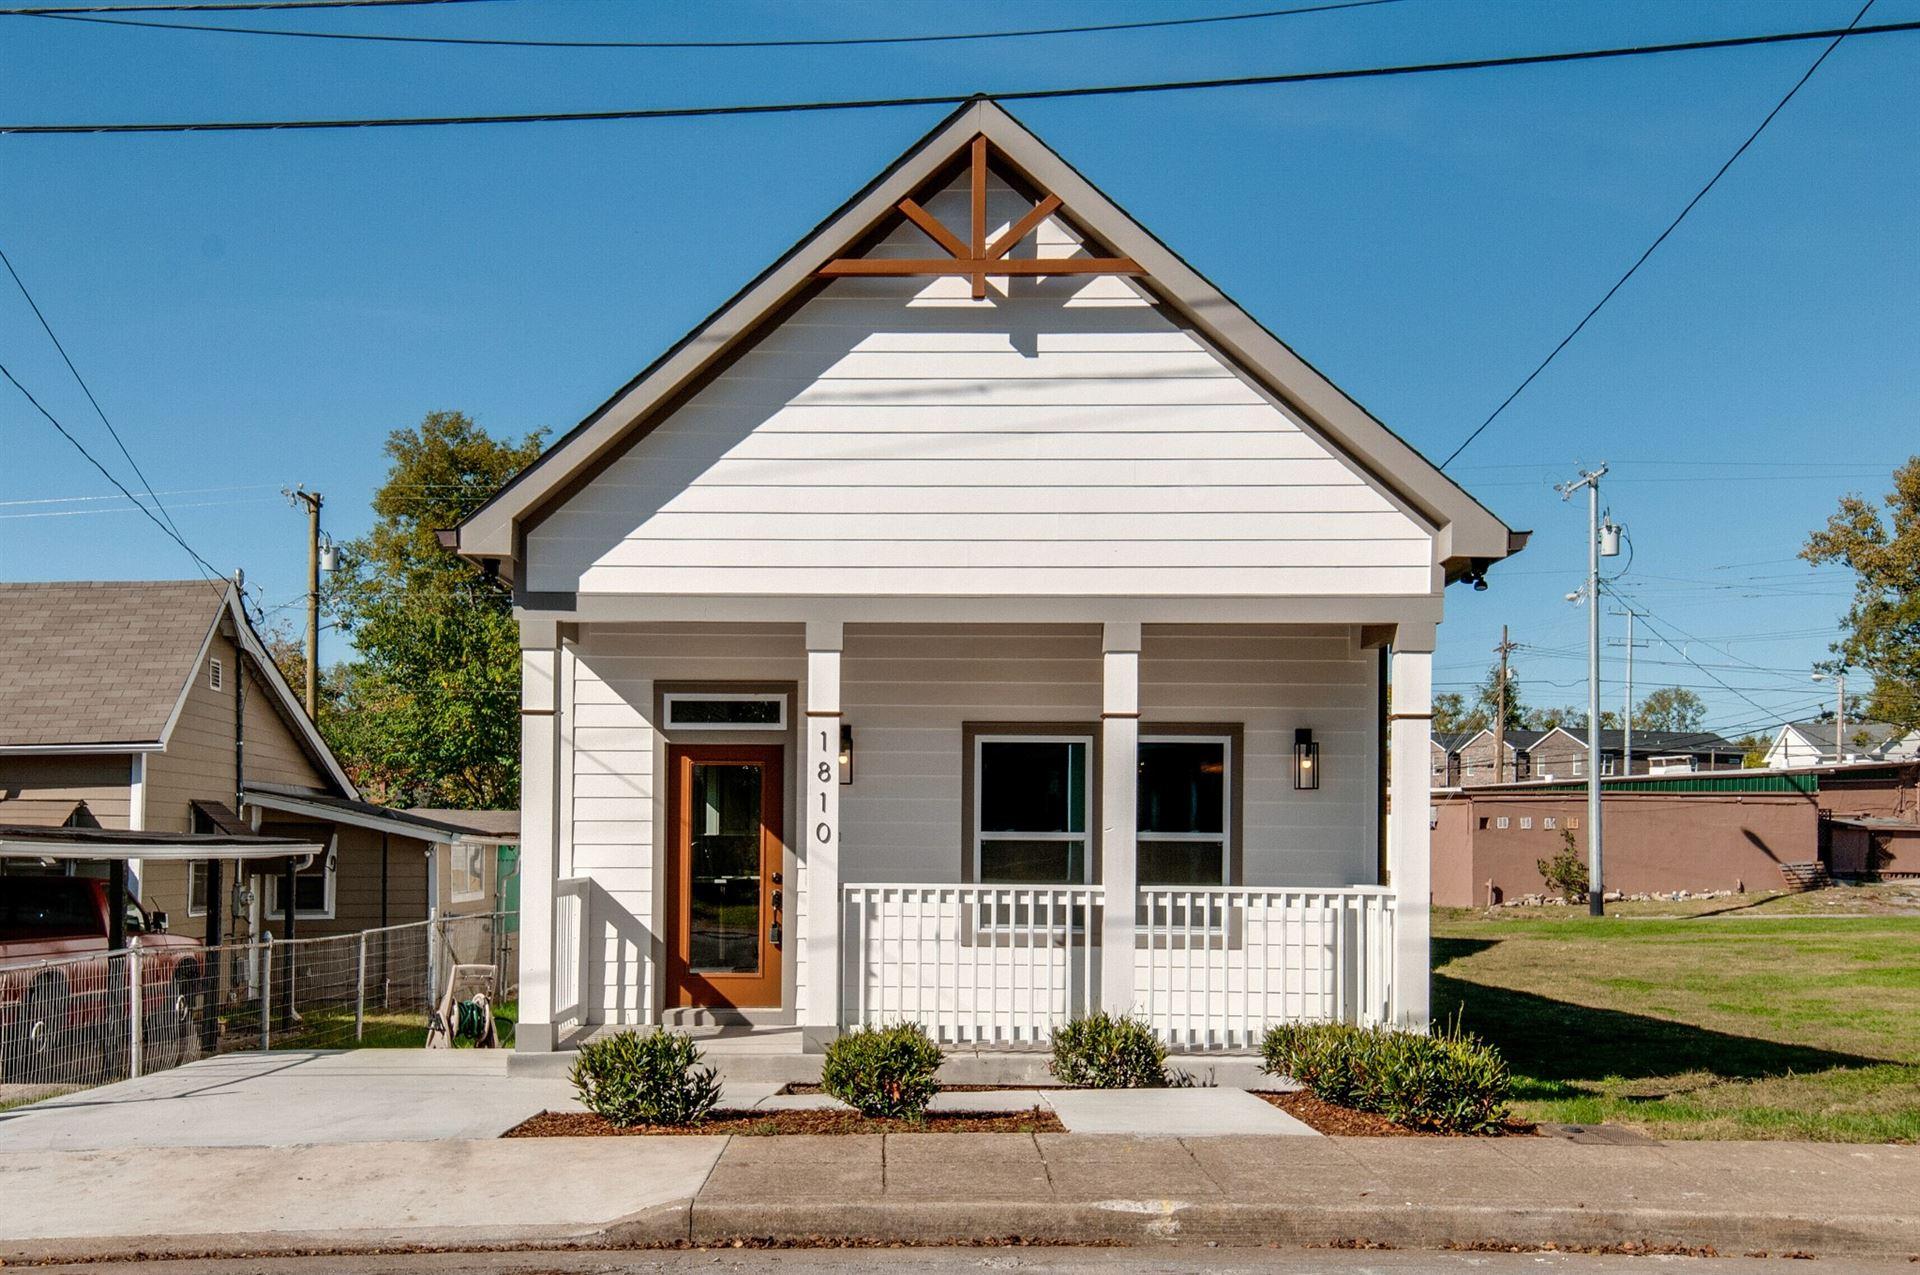 1810 Knowles St, Nashville, TN 37208 - MLS#: 2186460